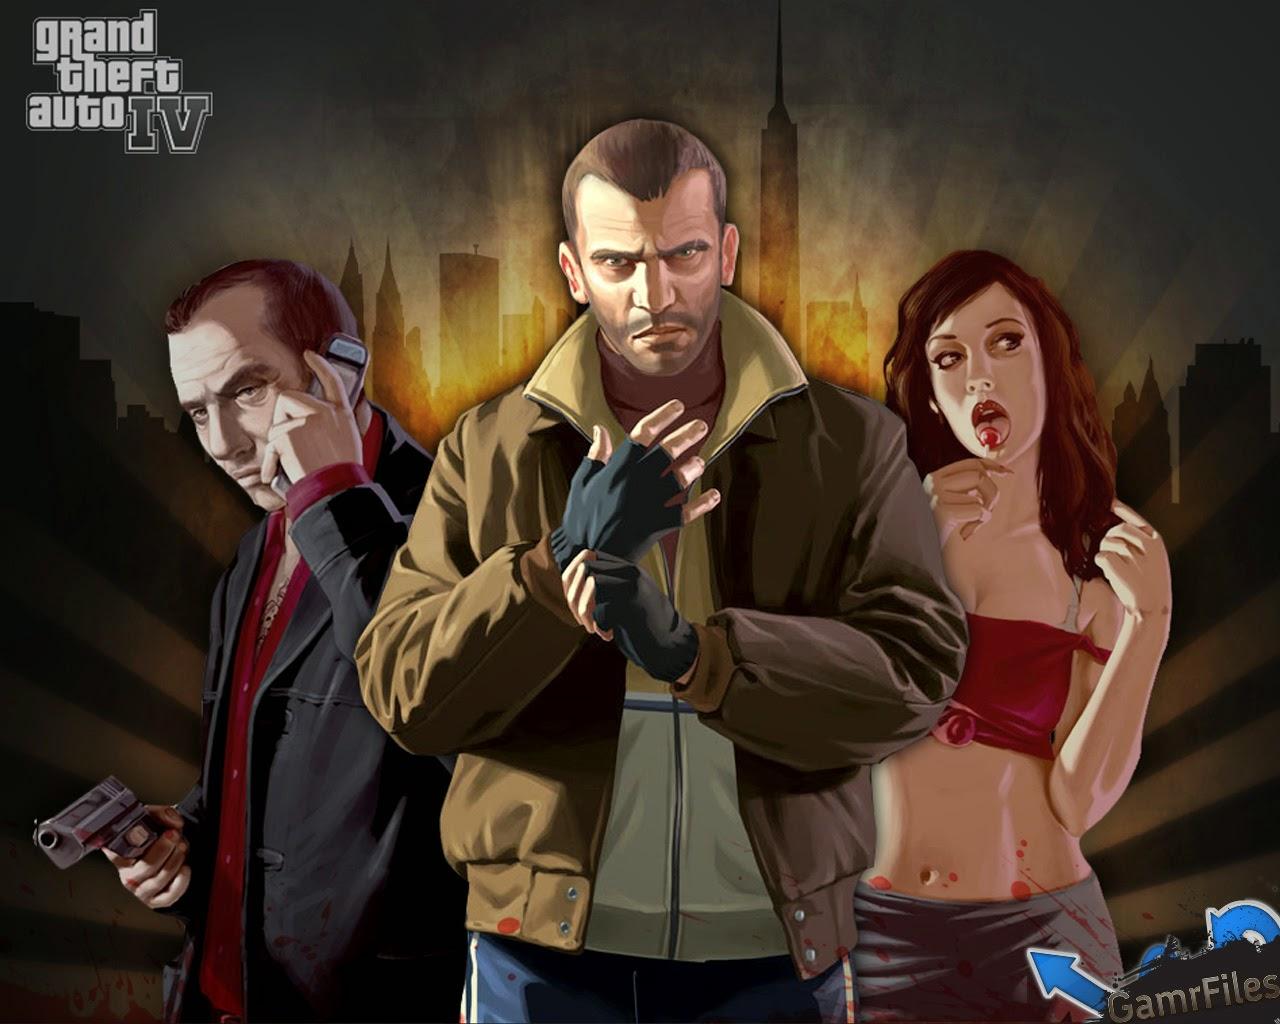 GTA IV 2015 Demo Download Totally Free: Get GTA 6 (Grand